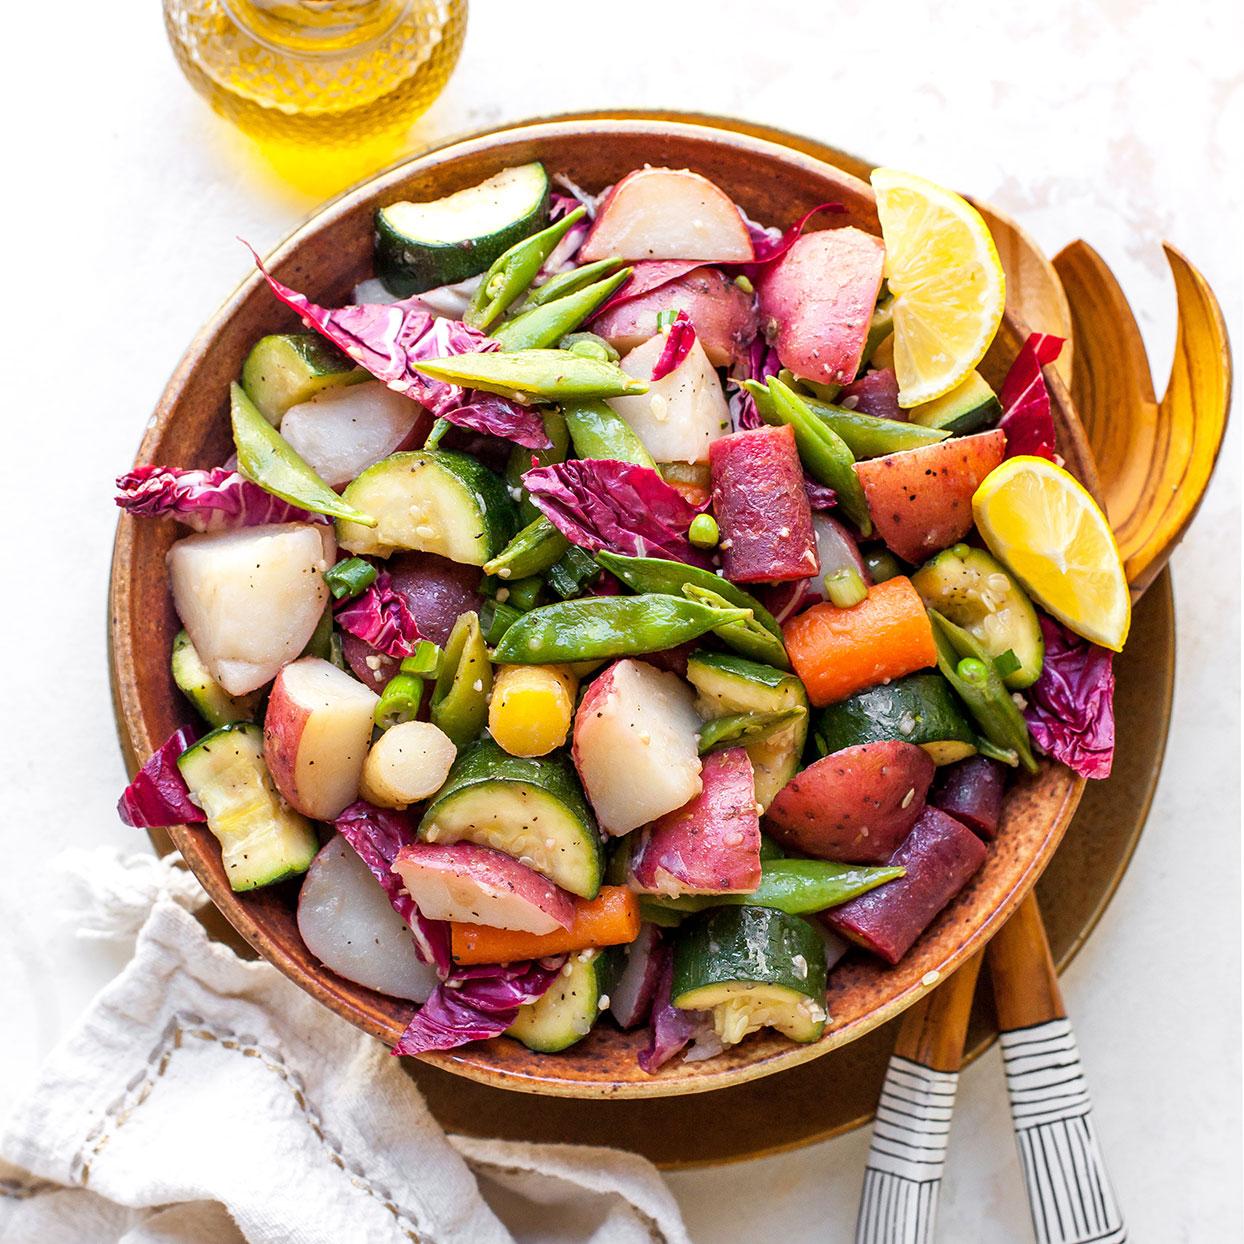 Italian Potato Salad Trusted Brands